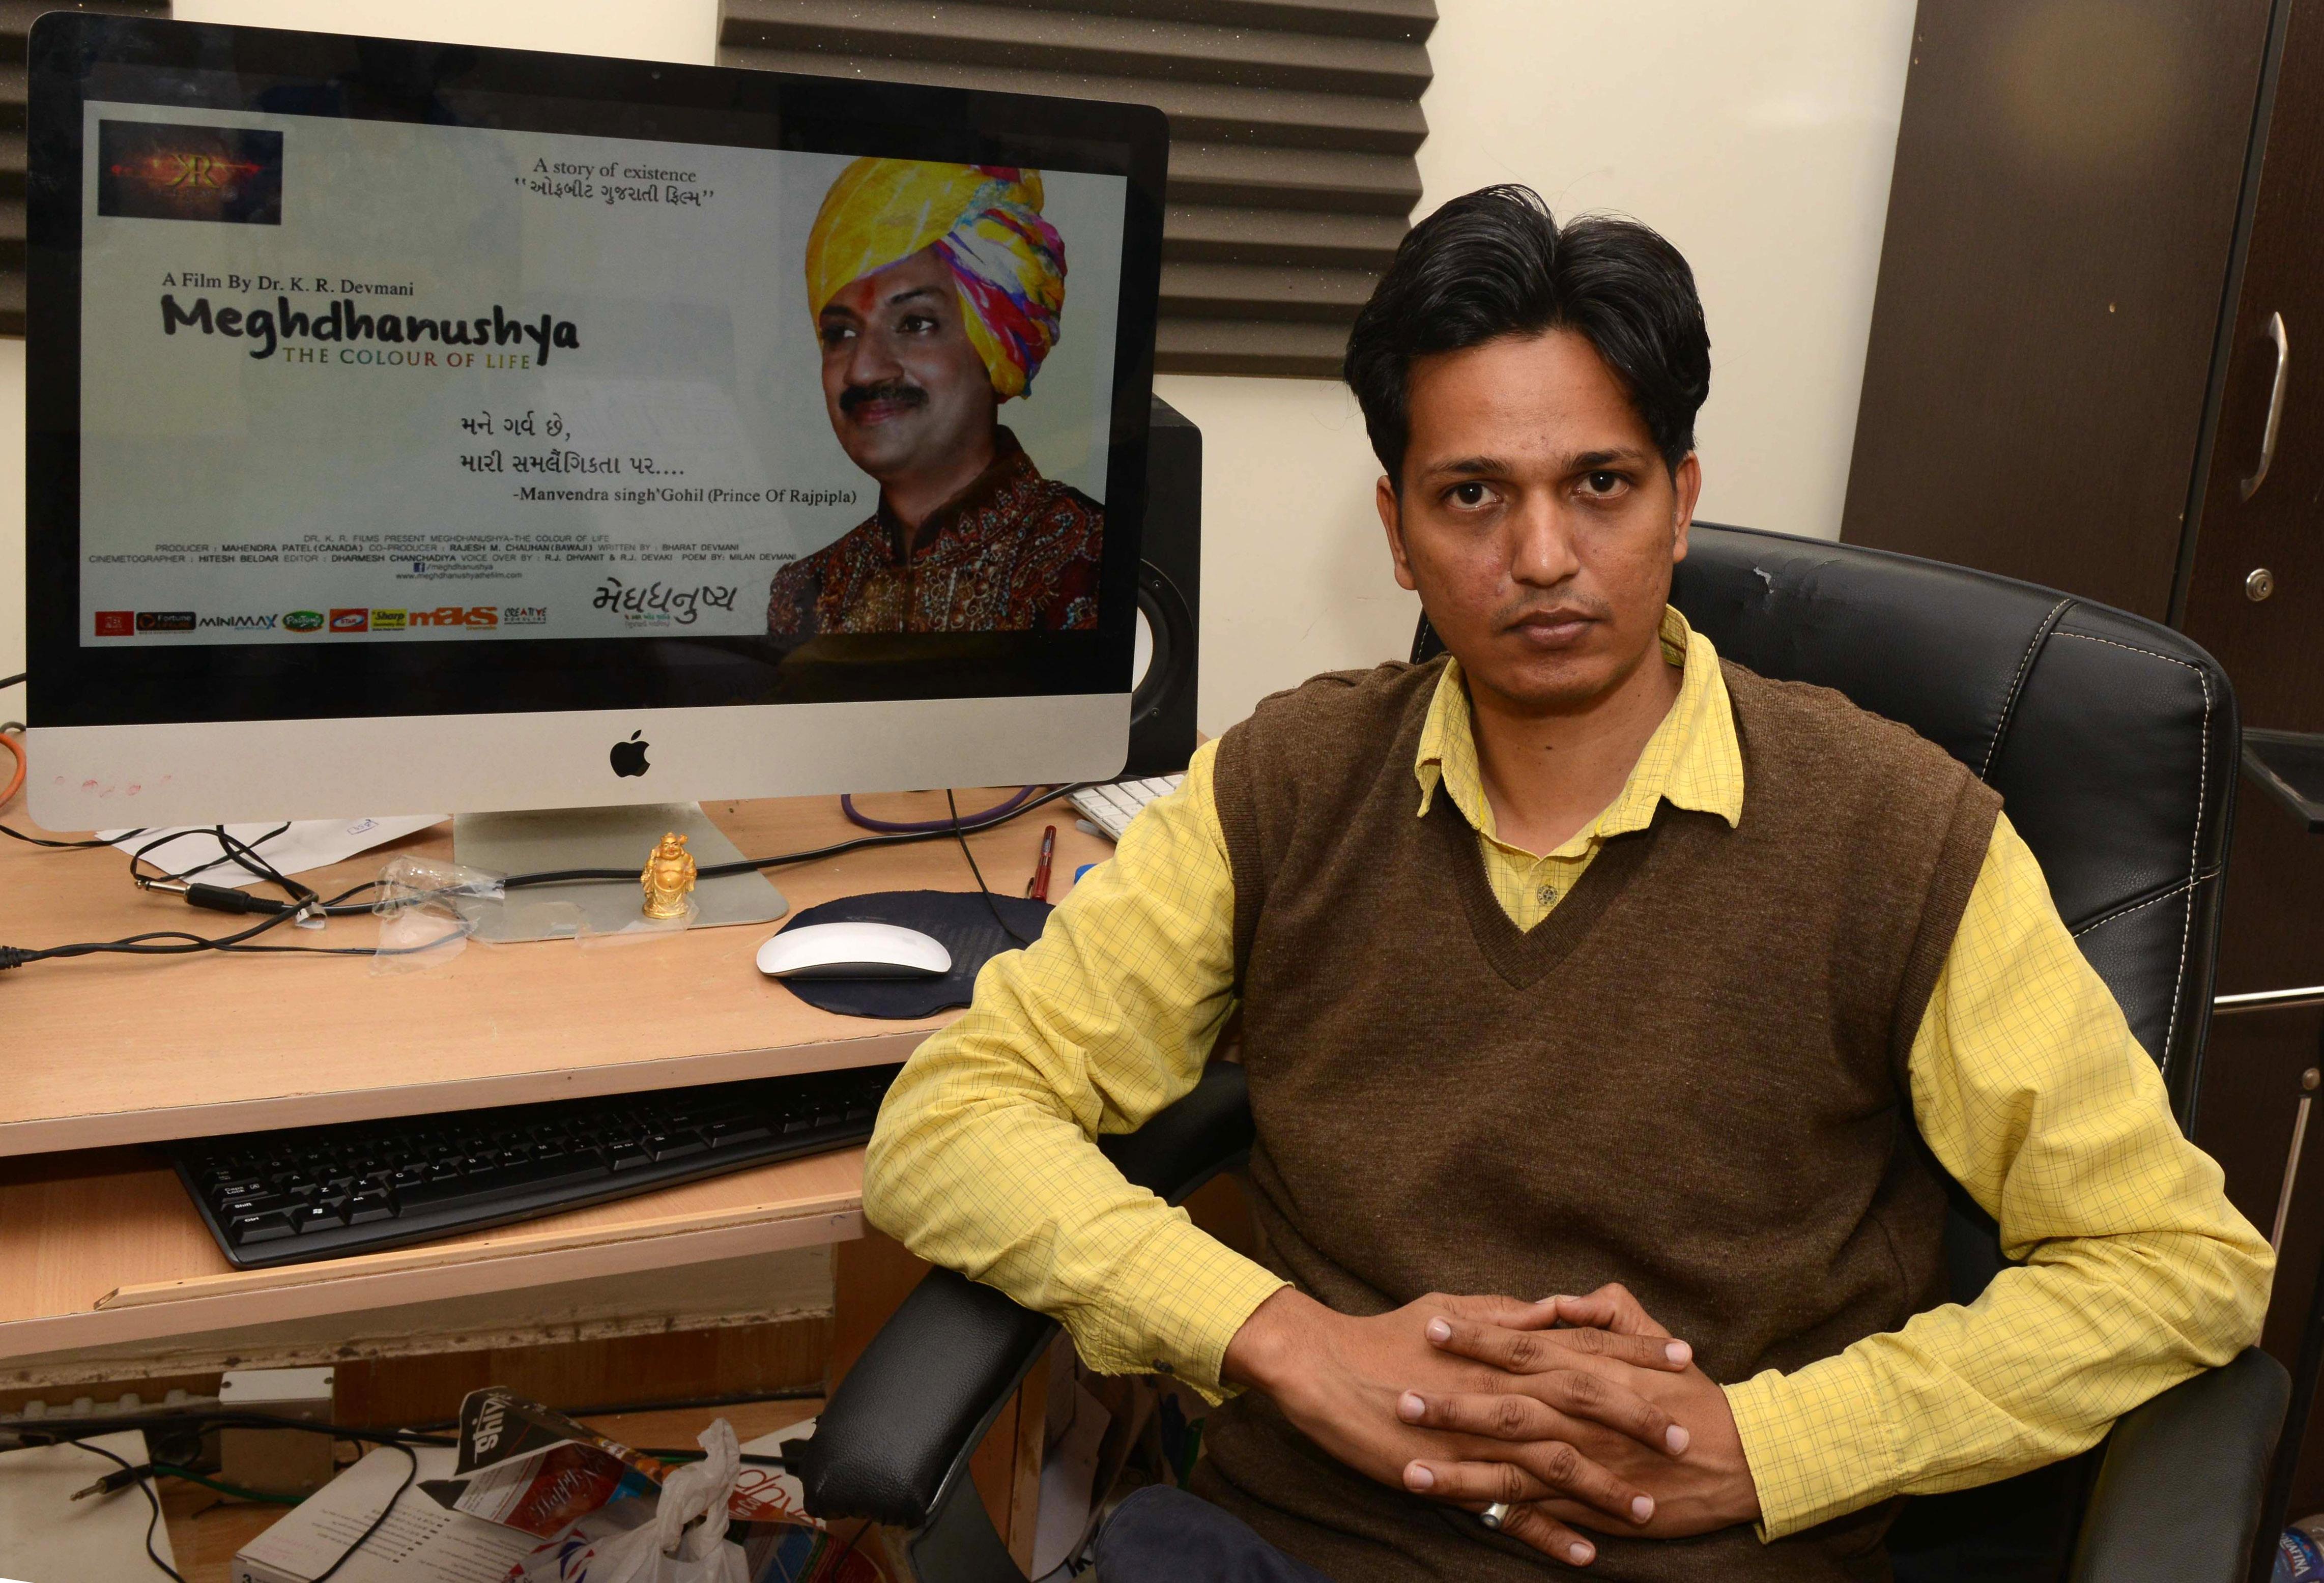 Indian filmmaker Kiran Kumar Devmani poses inside his office in Ahmedabad on Feb. 1, 2016